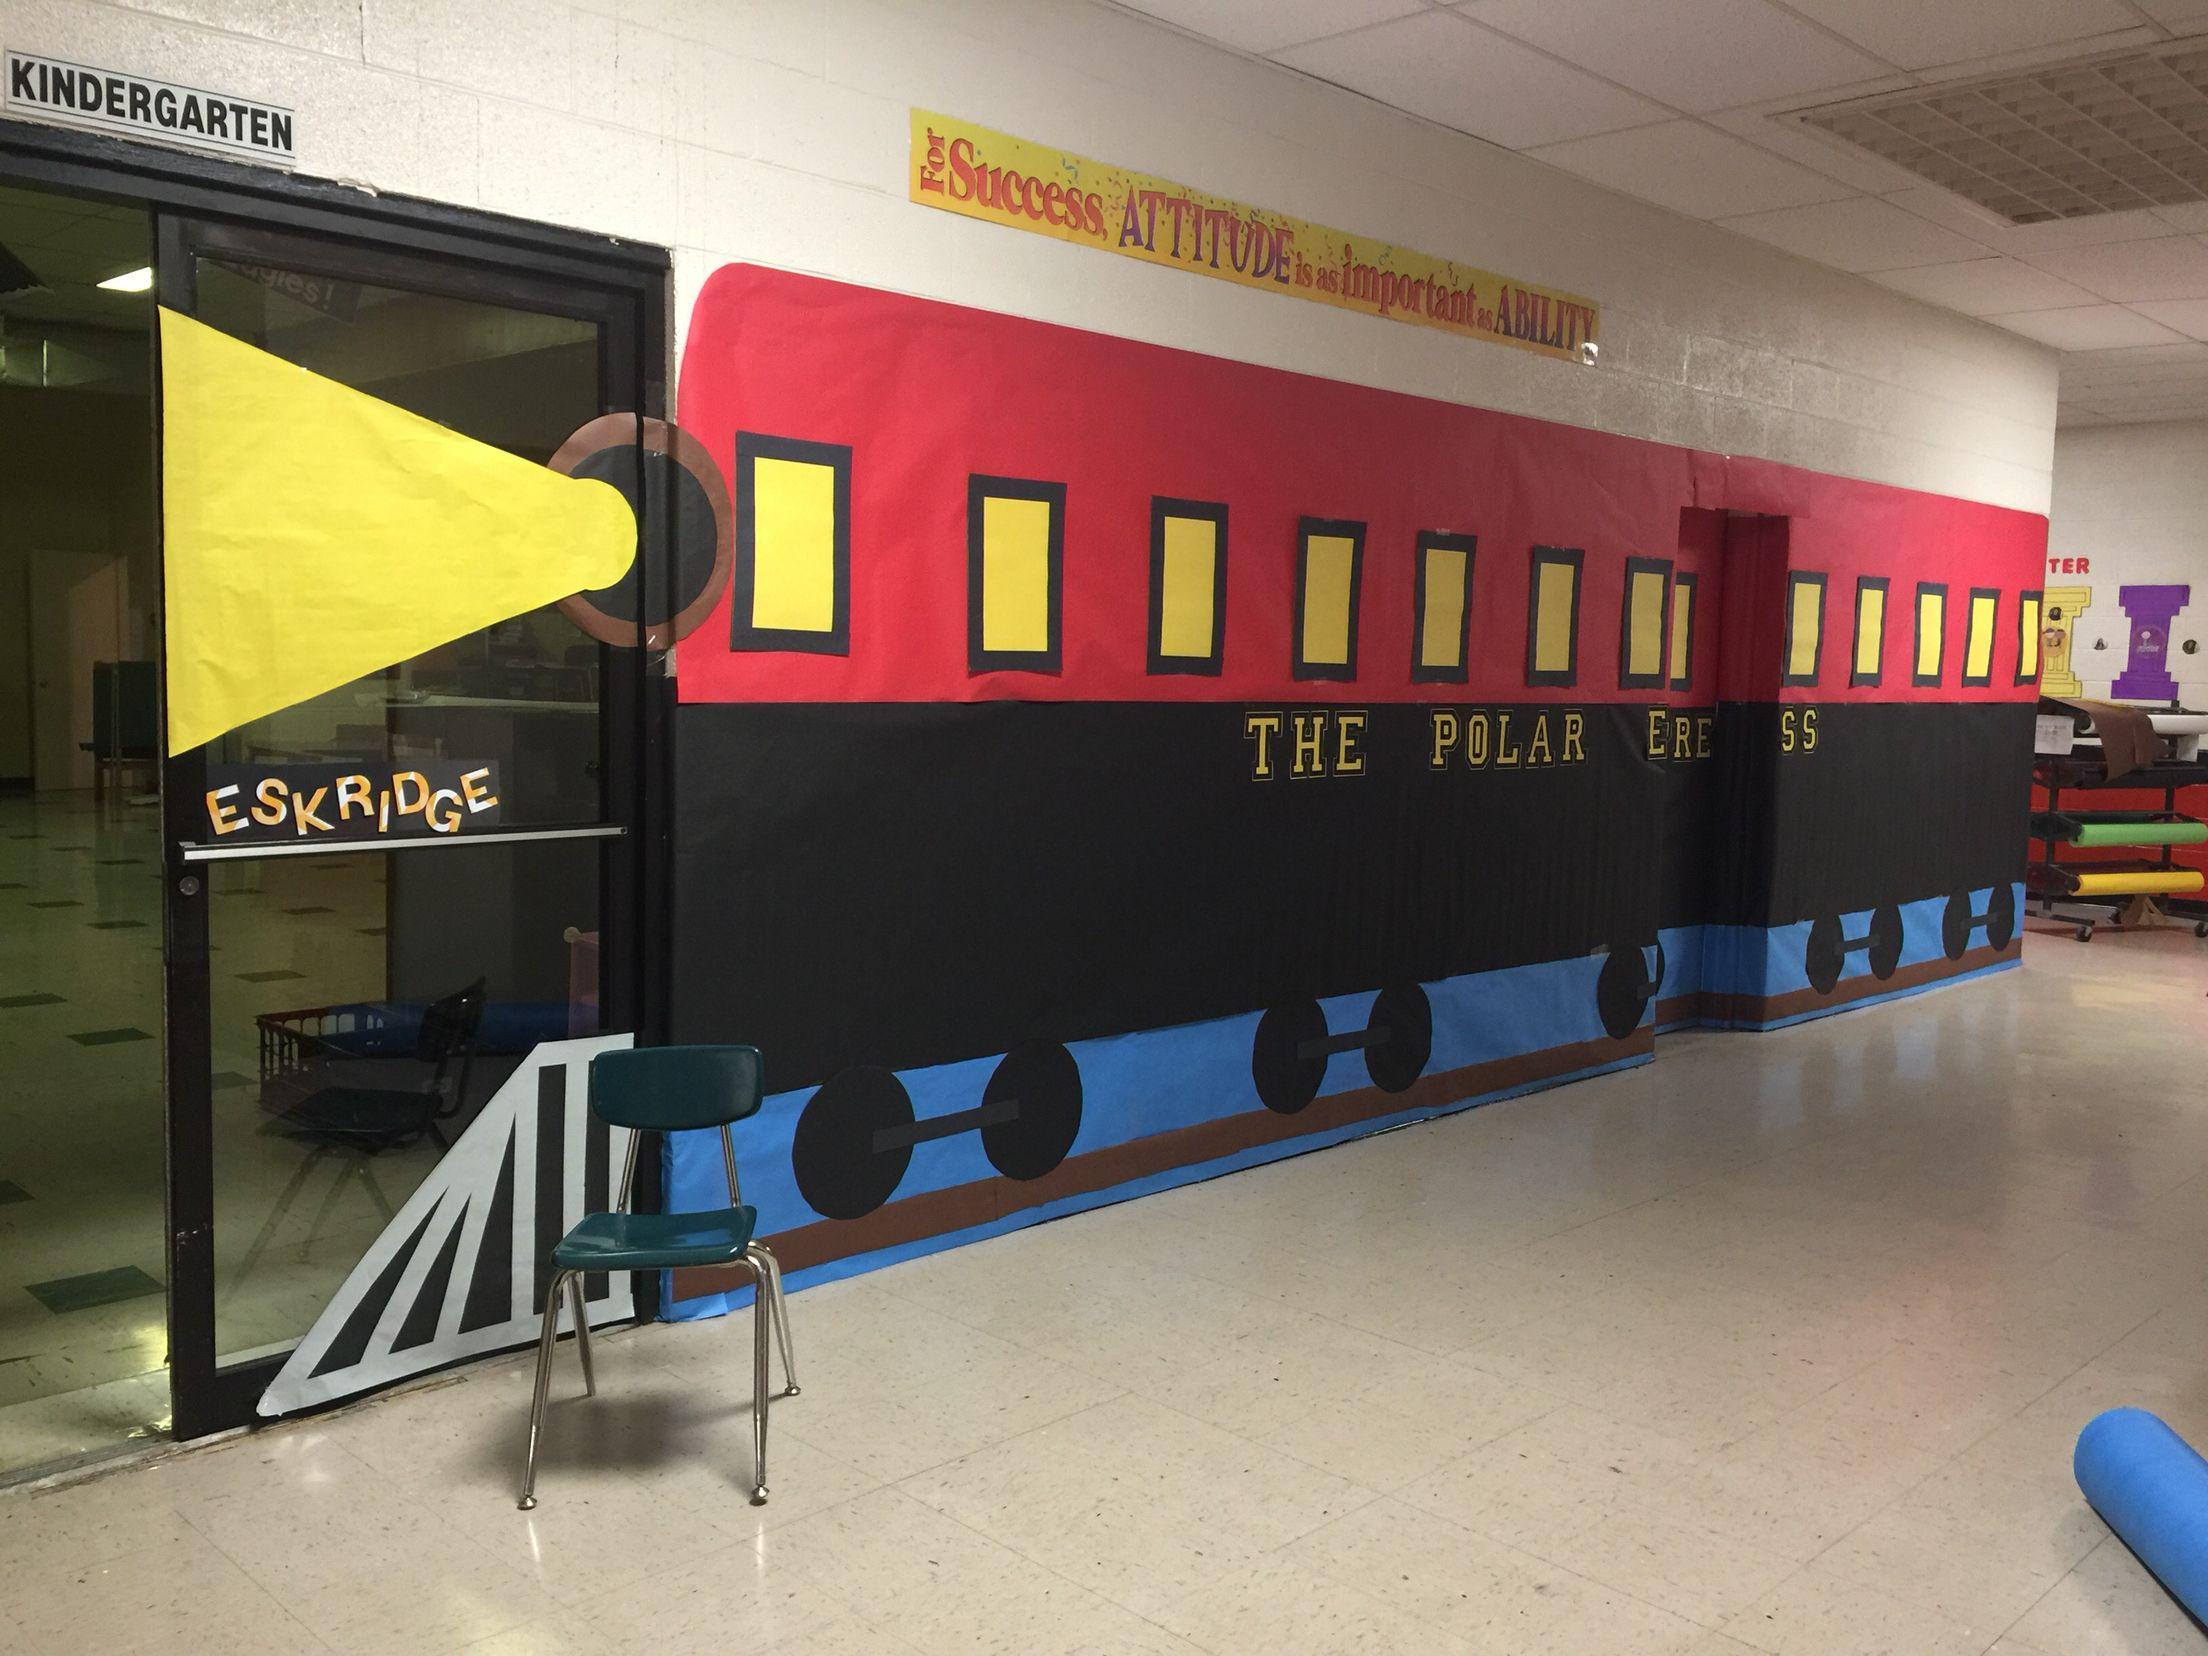 My Polar Express train